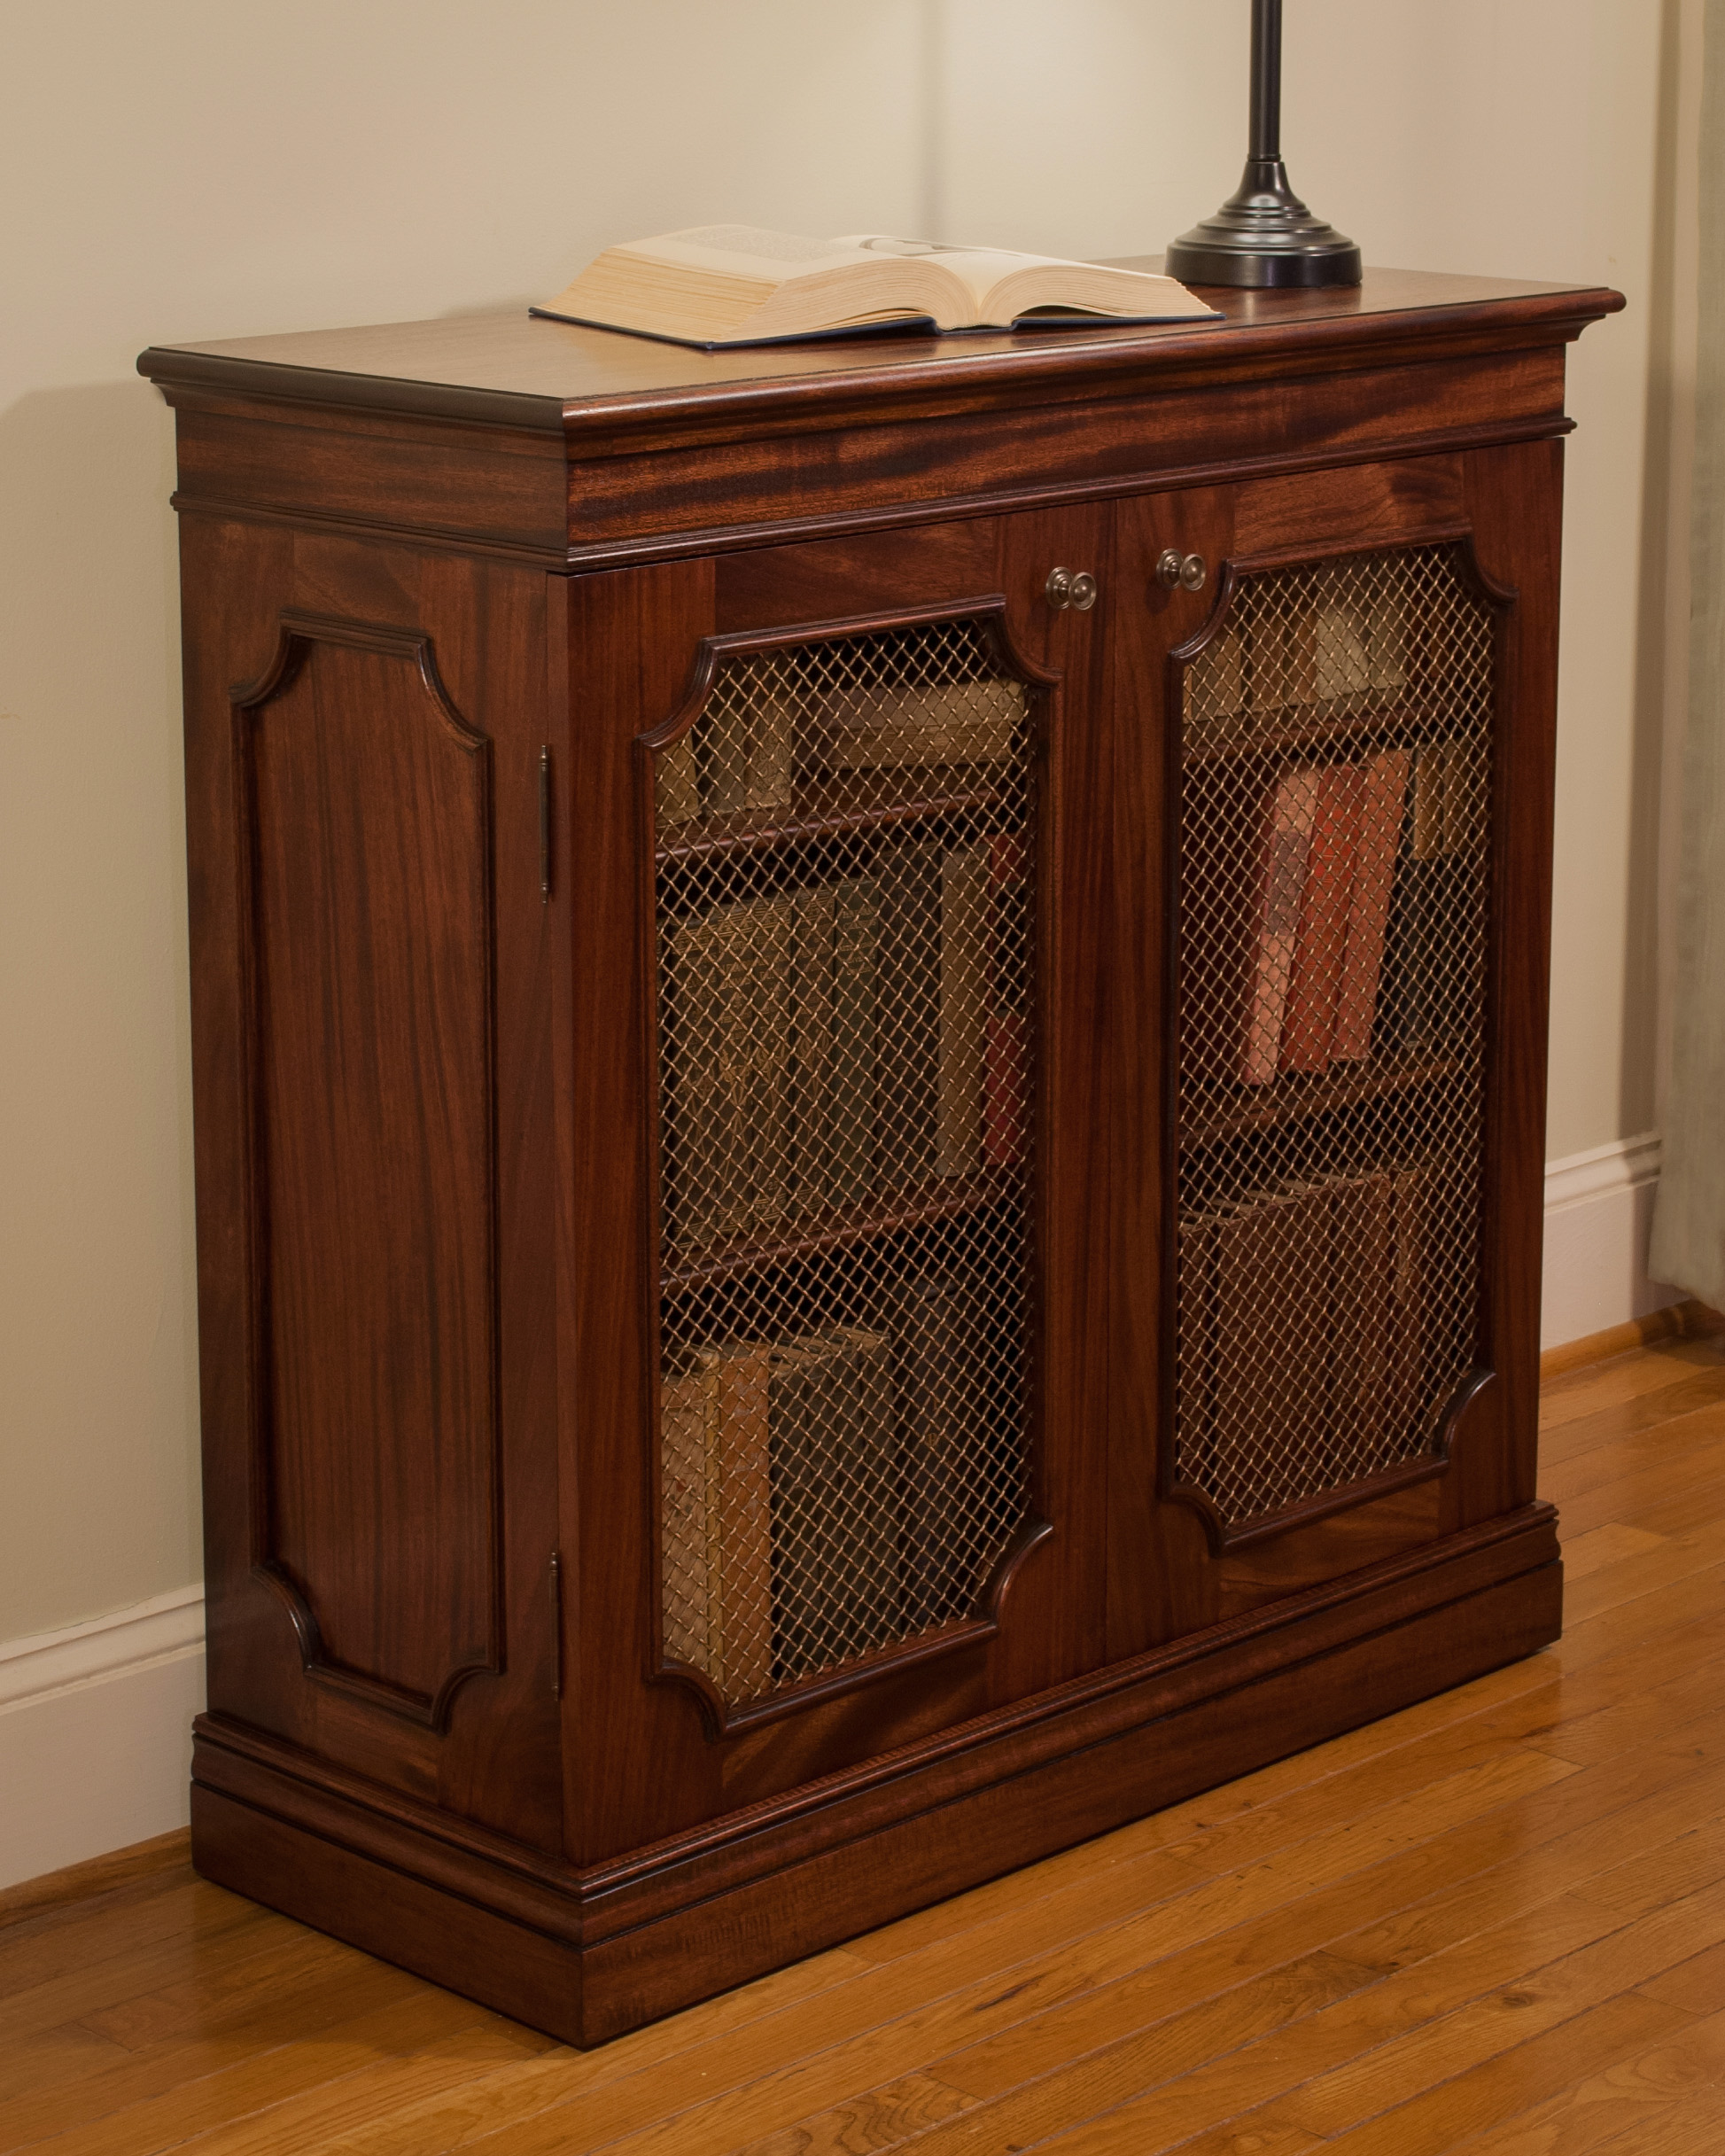 Traditional-Mahogany-Bookcase-Design-1.jpg